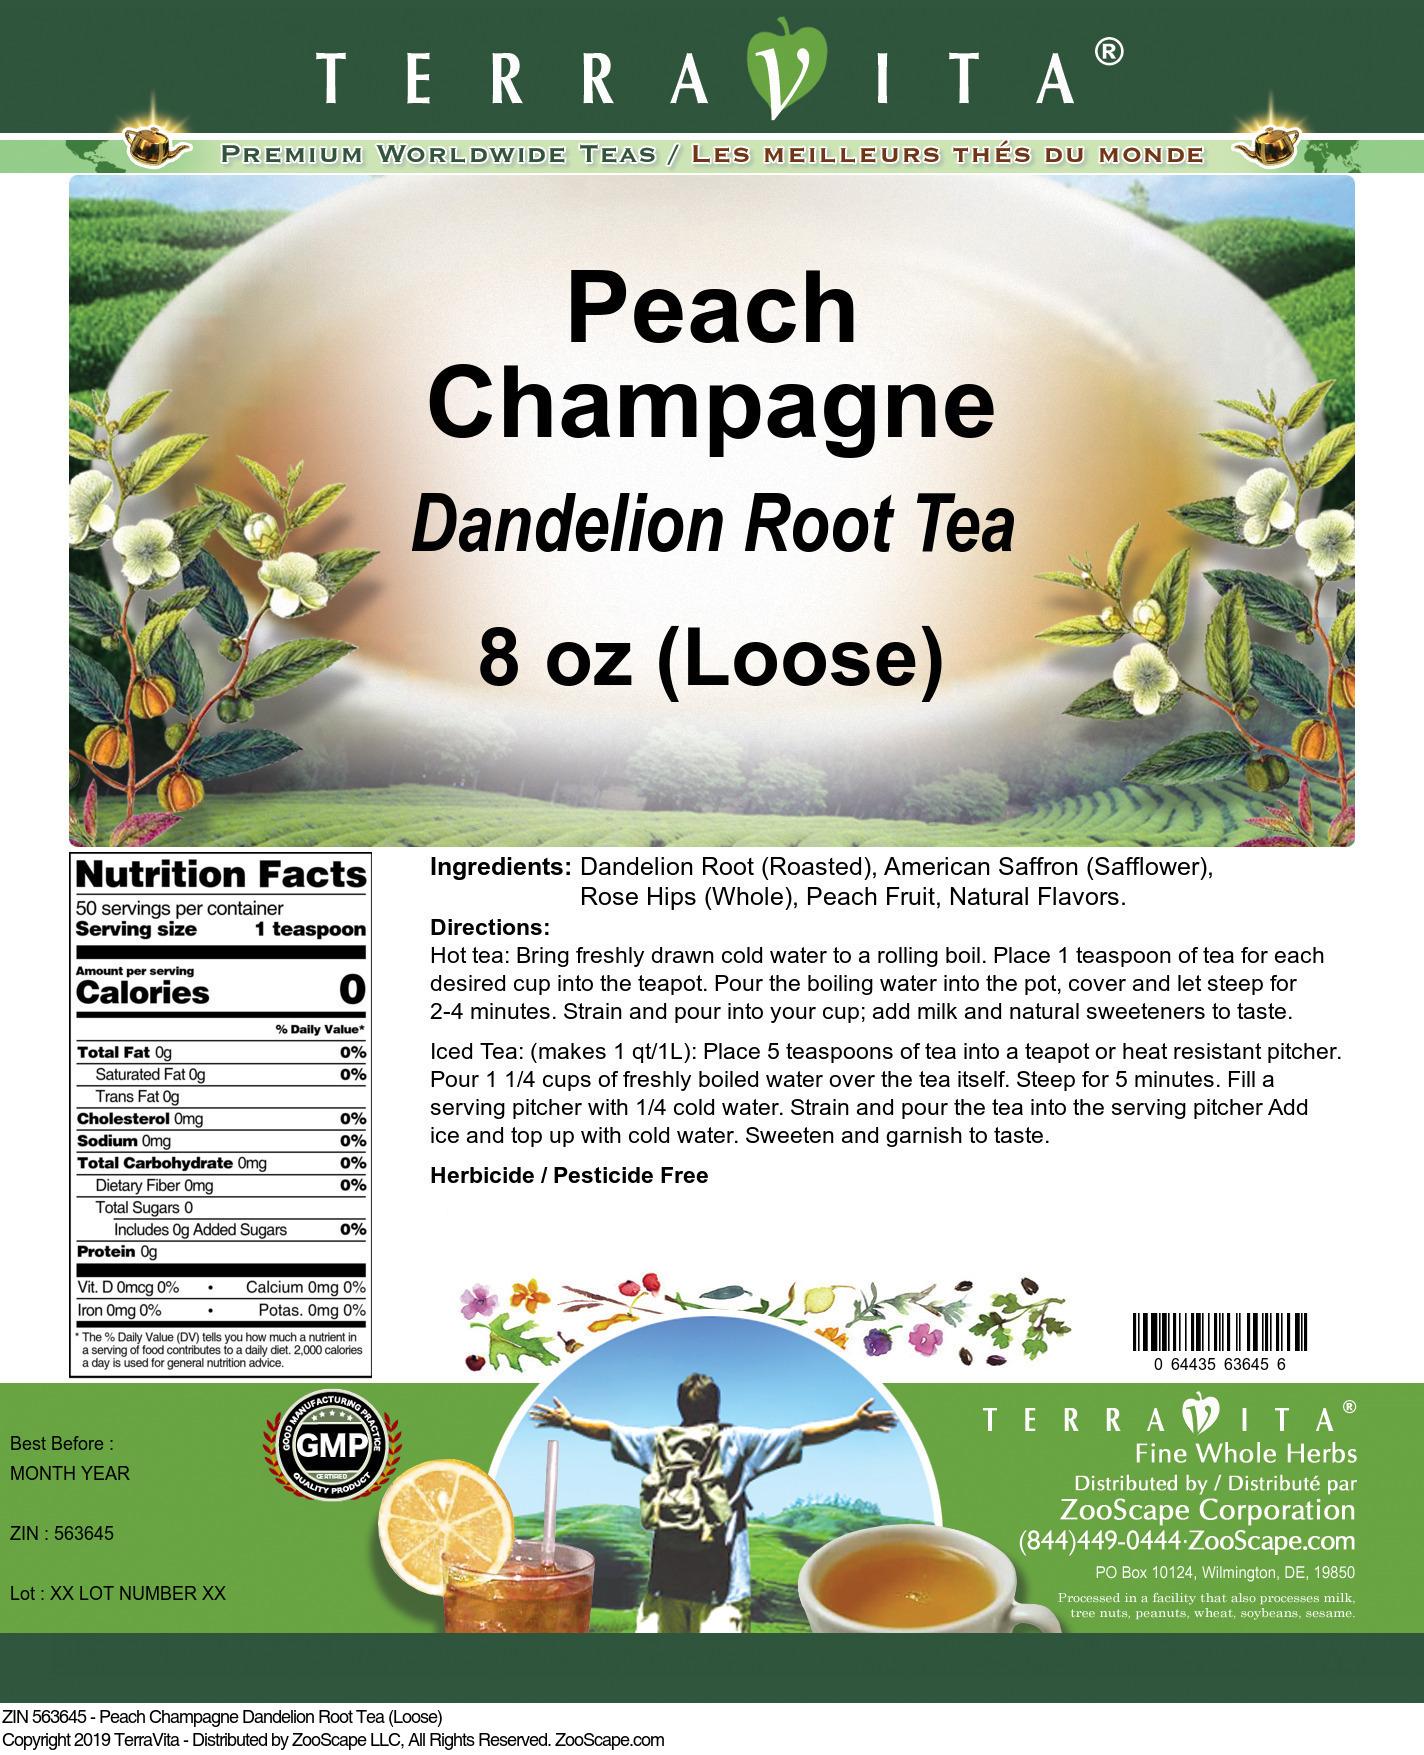 Peach Champagne Dandelion Root Tea (Loose)